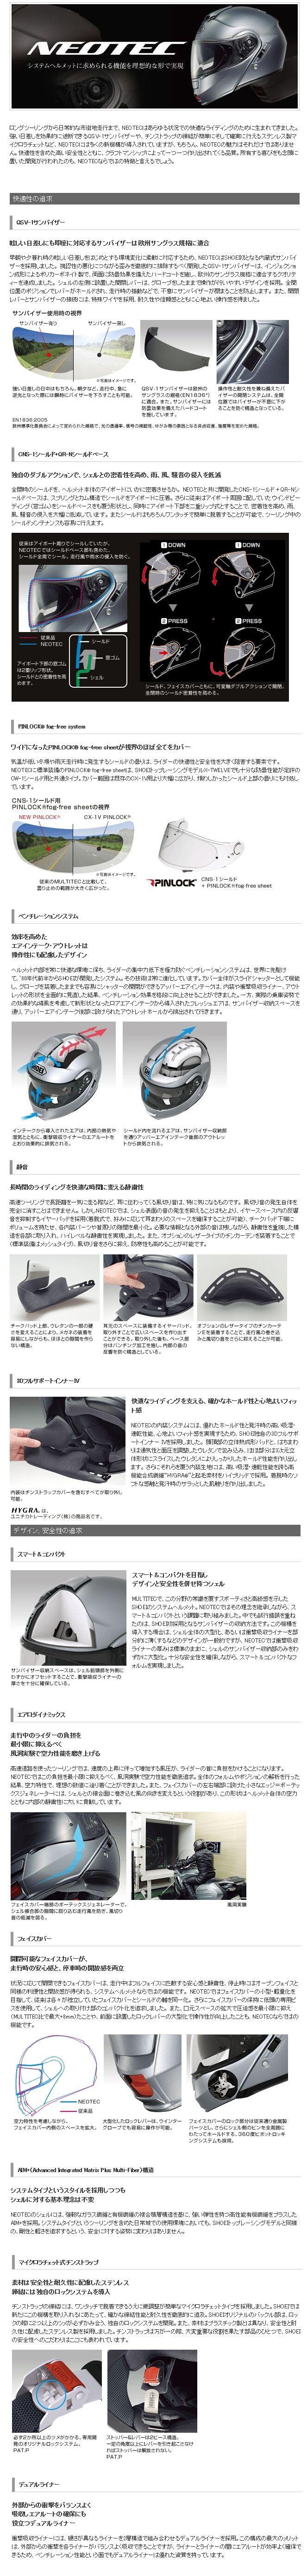 【SHOEI】NEOTEC BOREALIS全罩式安全帽 - 「Webike-摩托百貨」